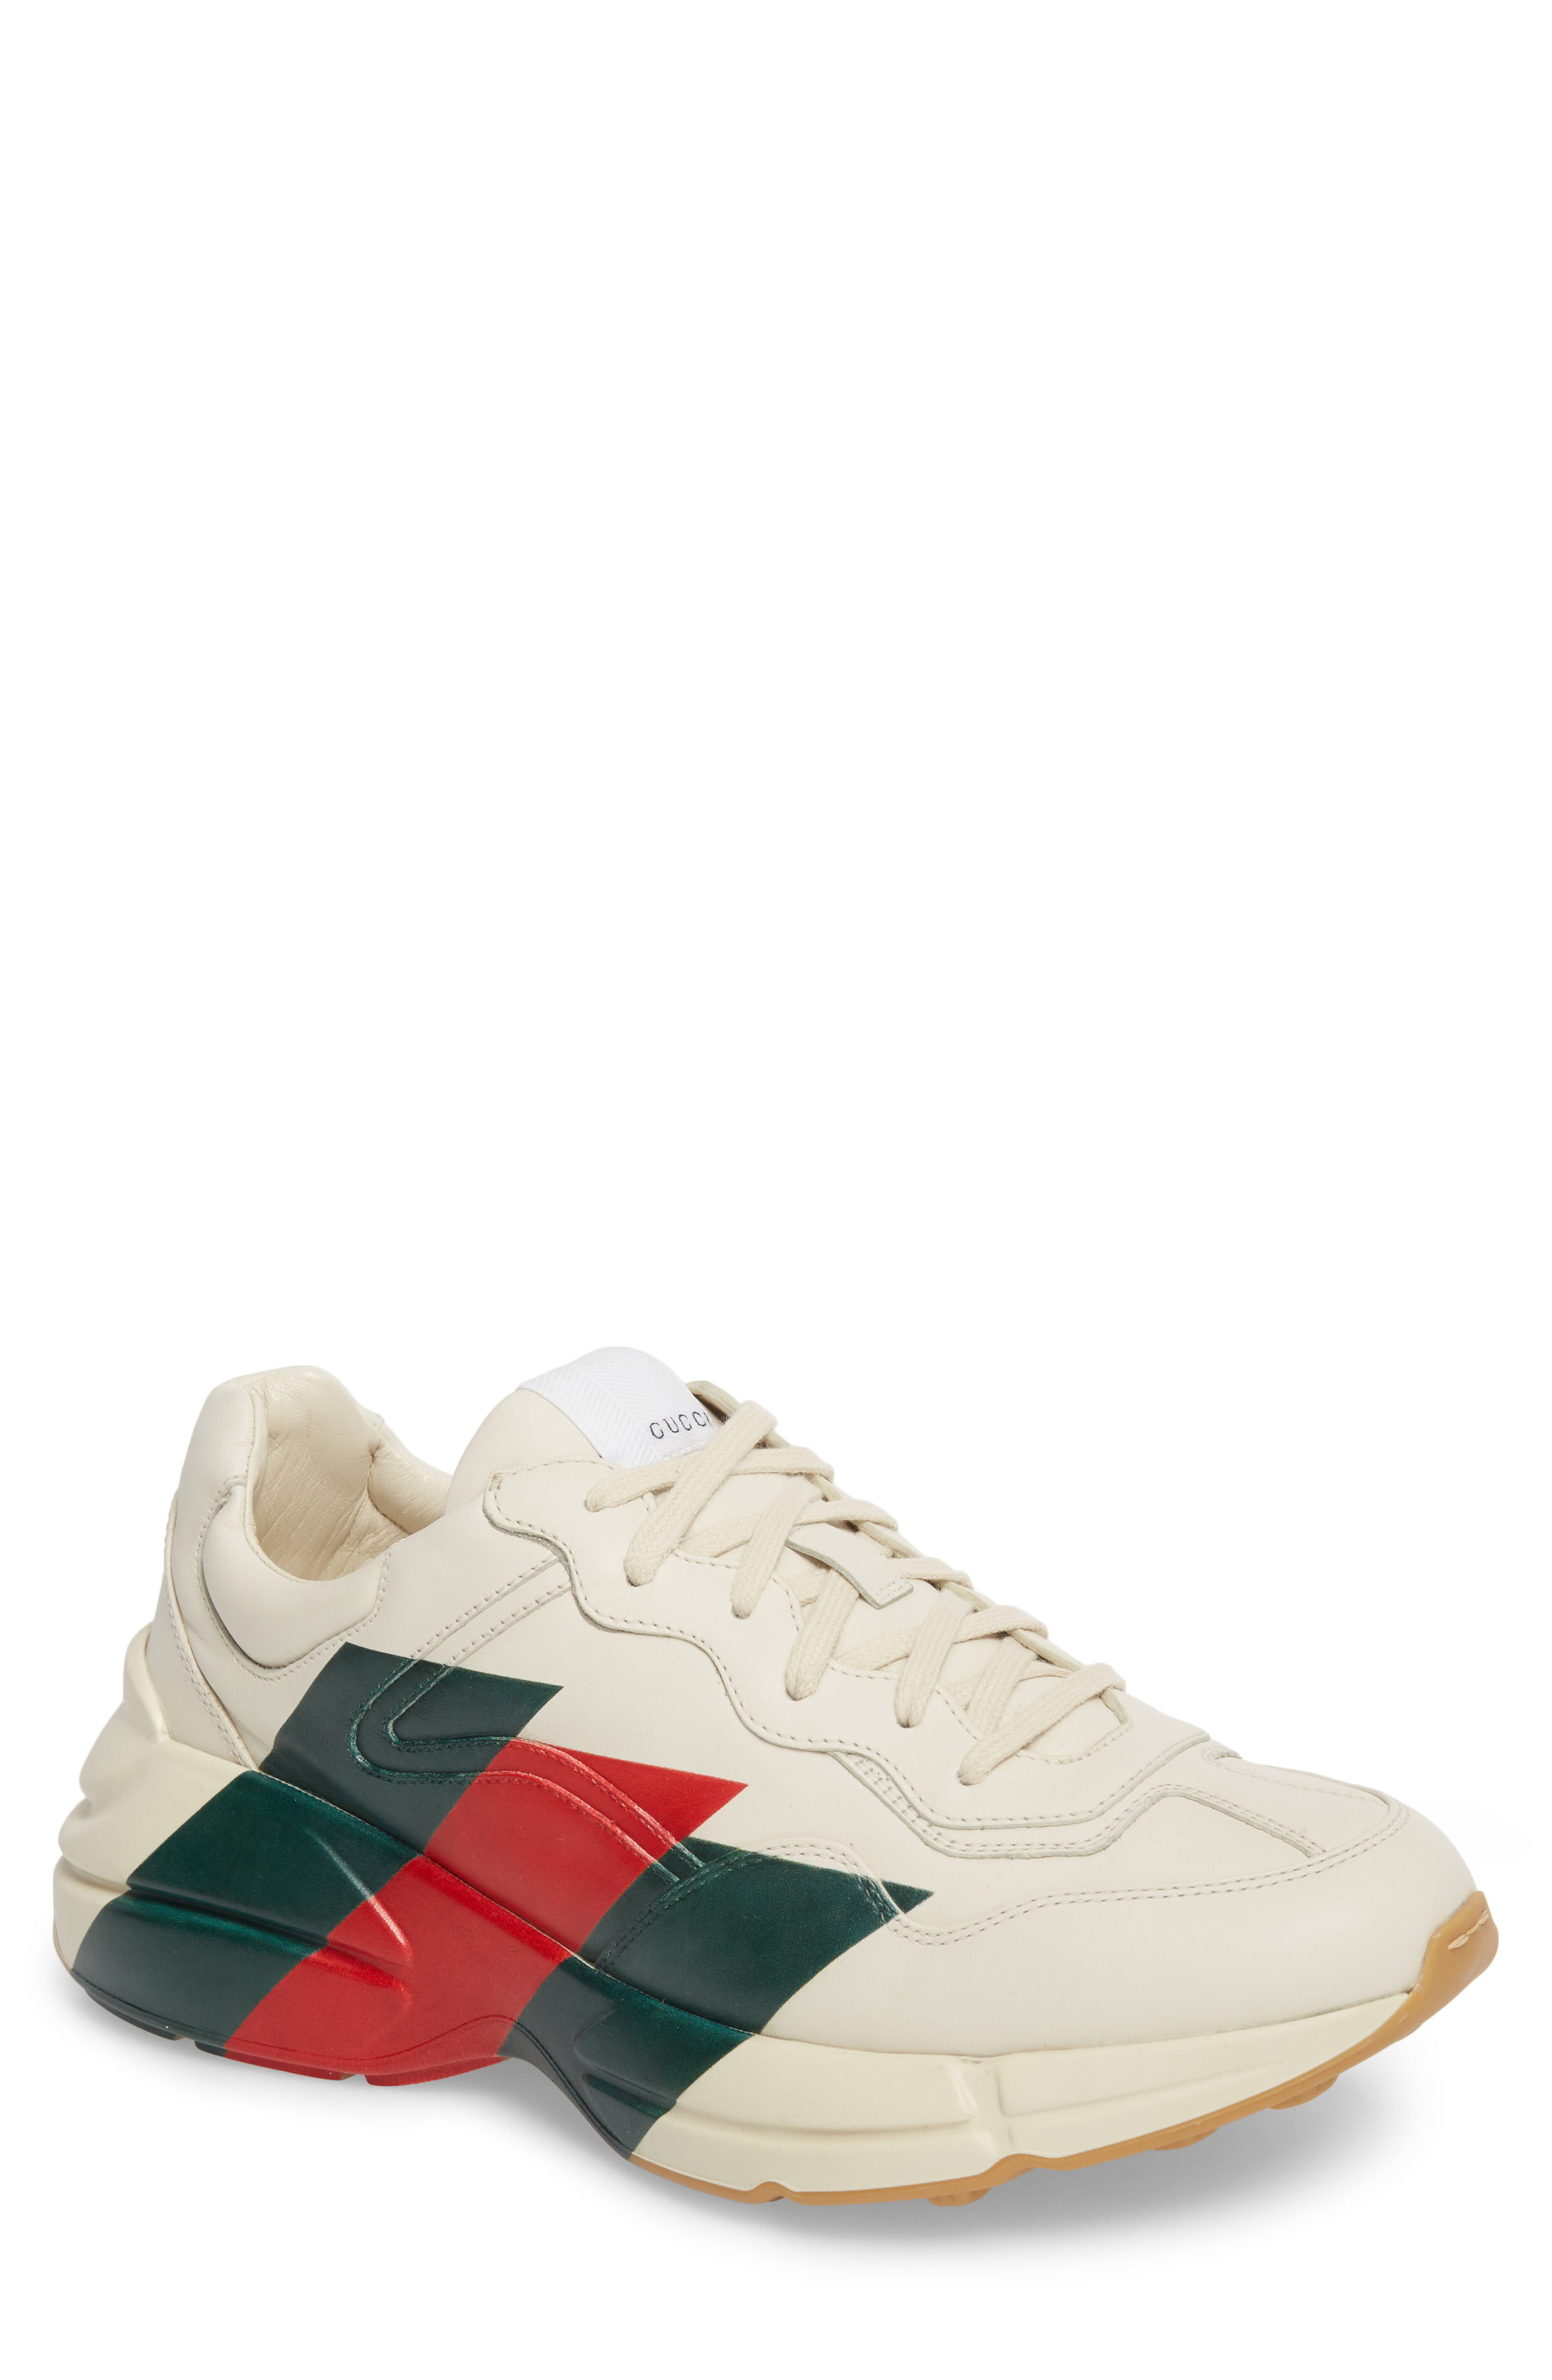 Men S Gucci Rhyton Sneaker Size 8 5us 7 5uk White The Fashionisto